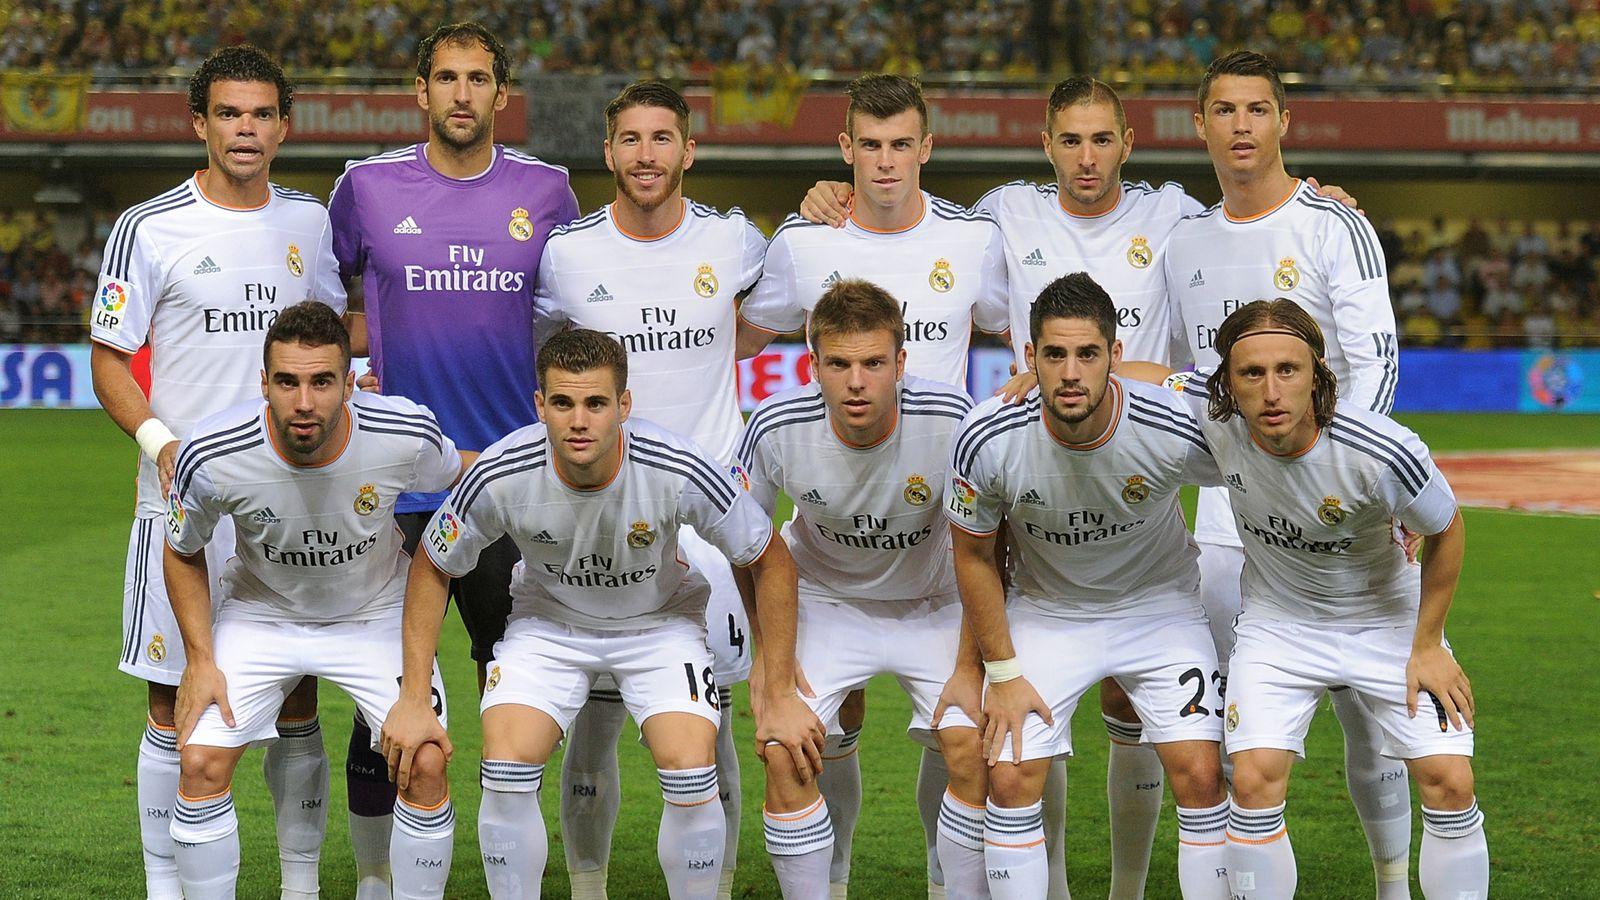 Managing Madrid A Real Madrid Community: Villarreal Vs. Real Madrid, Tactical Analysis: Madrid